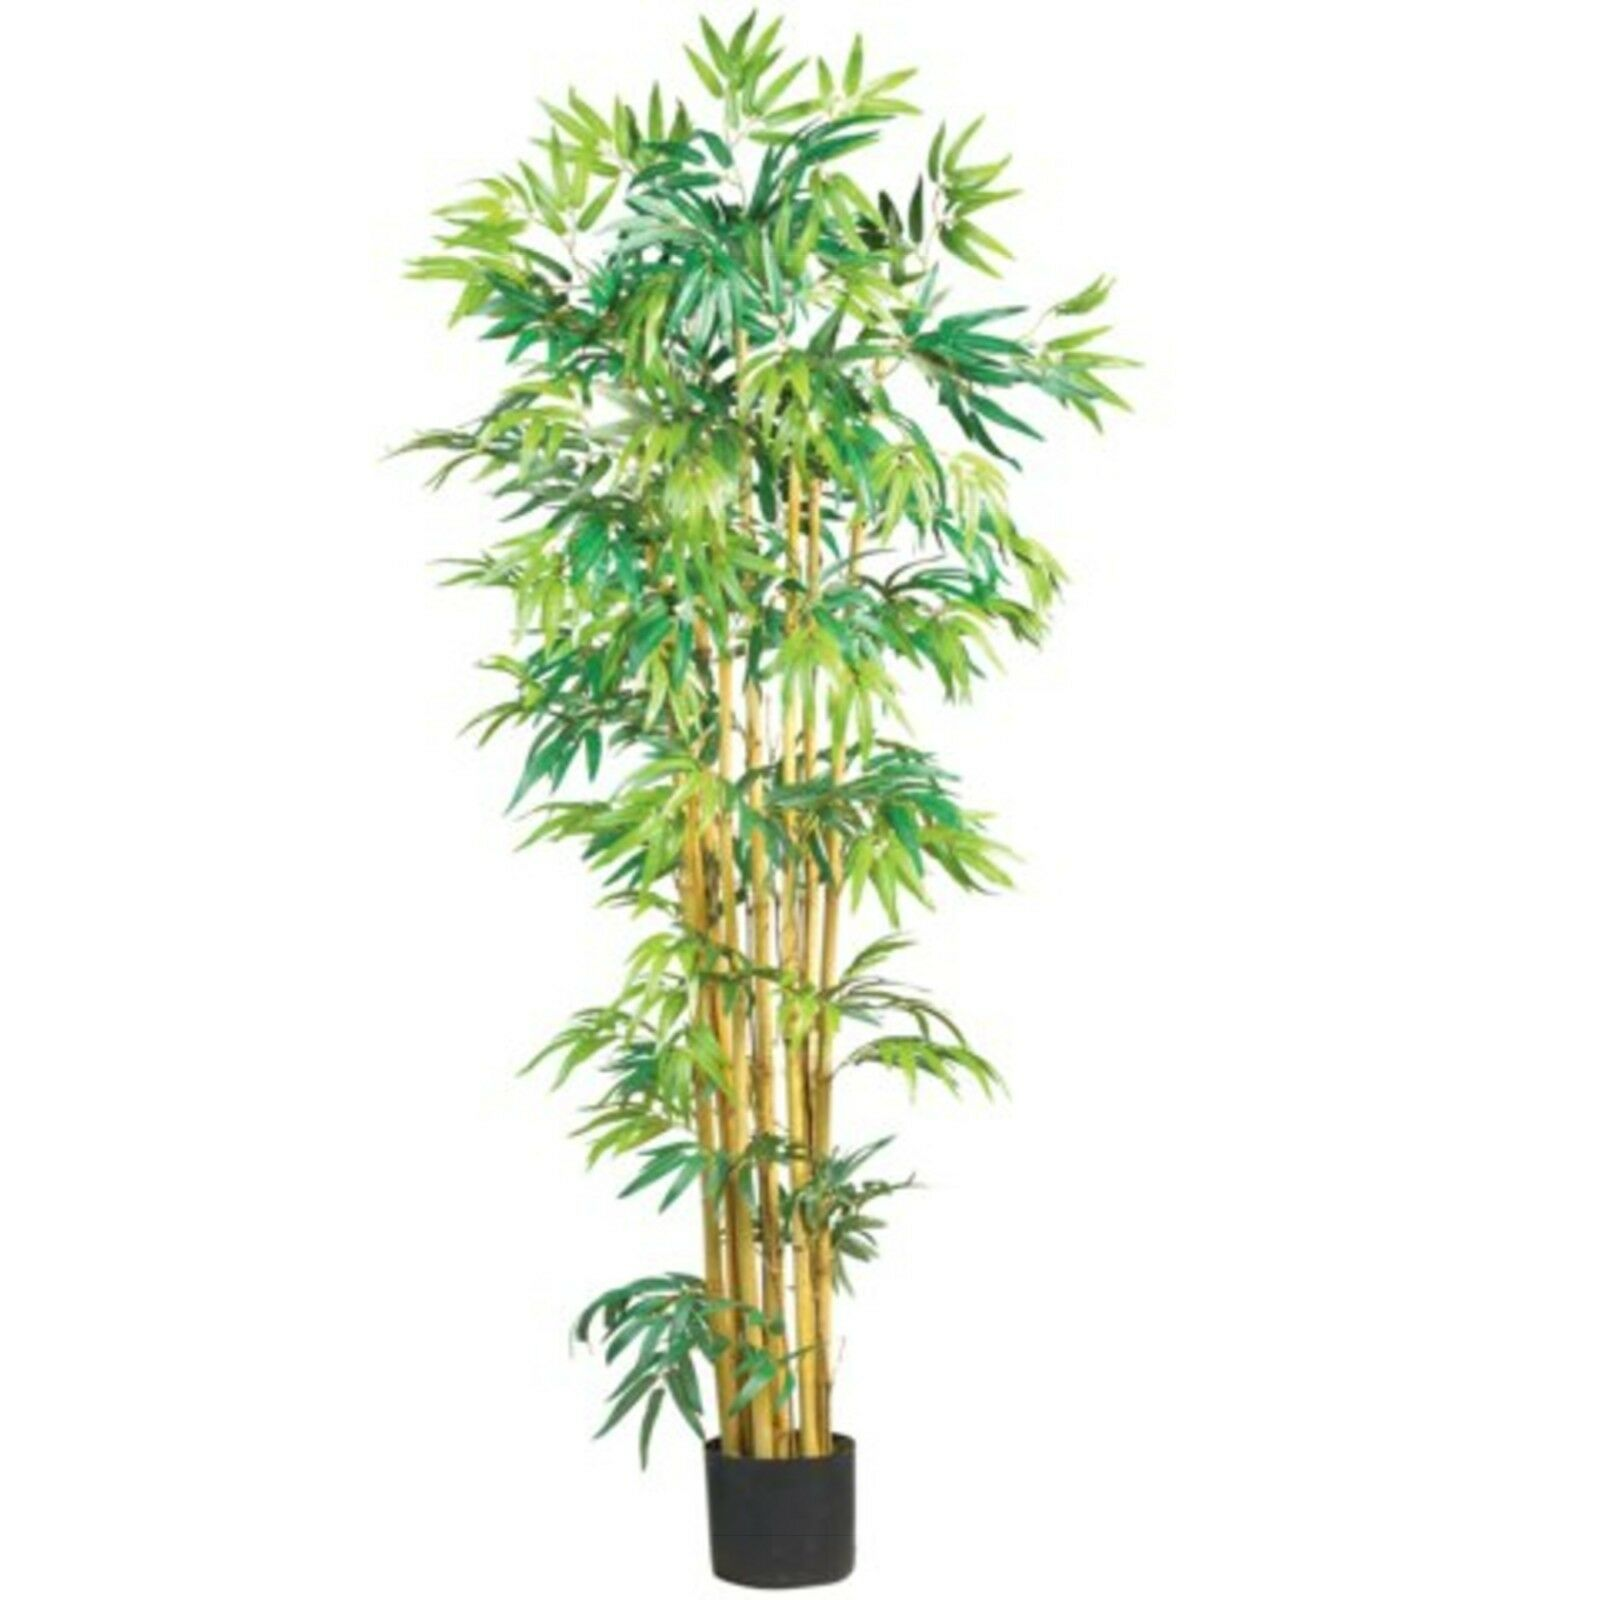 Decorative Natural Looking Artificial 5' Asian Multi Bambusa Bamboo Tree Plants